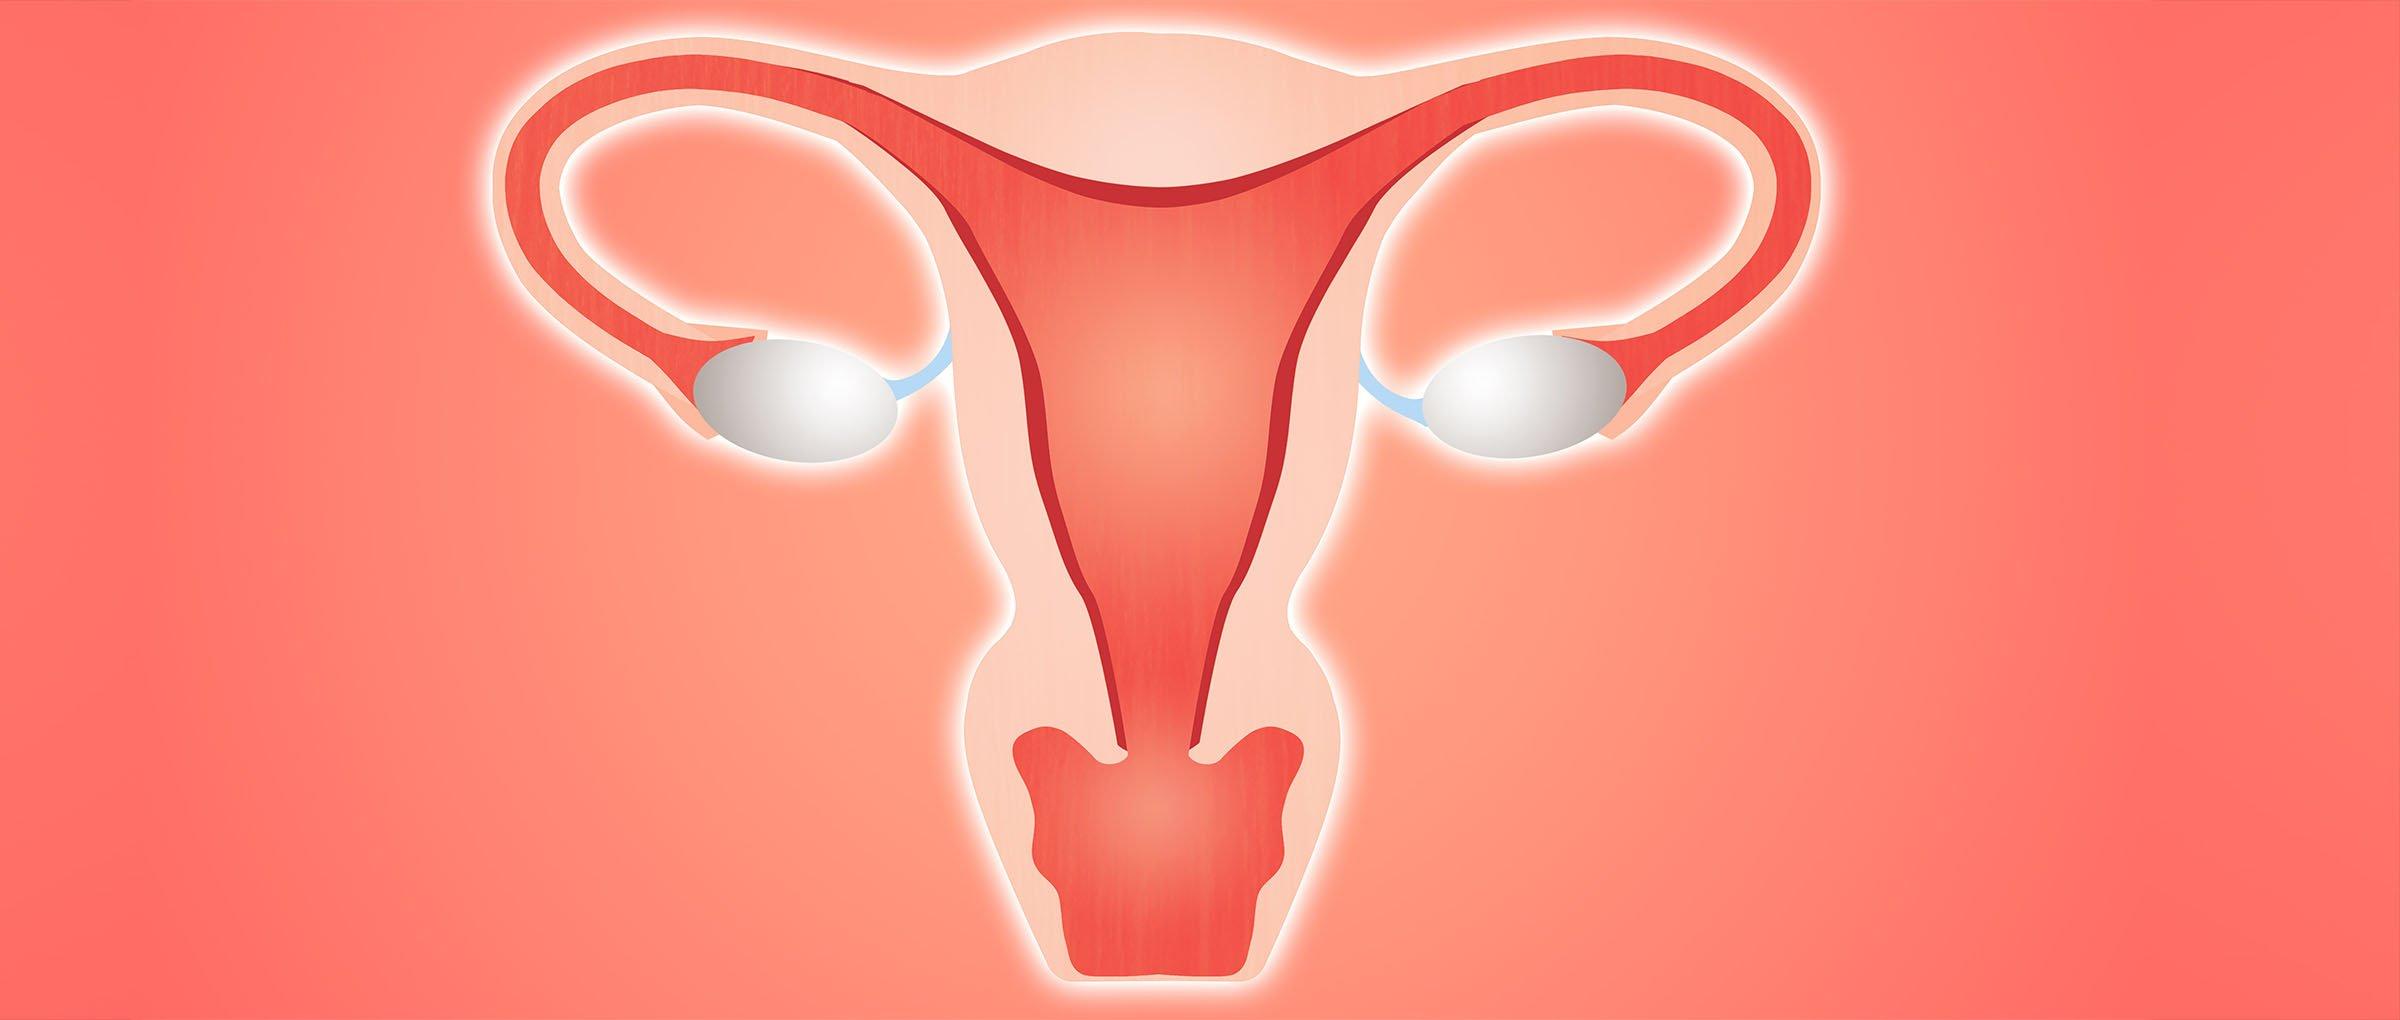 Preparar el endometrio